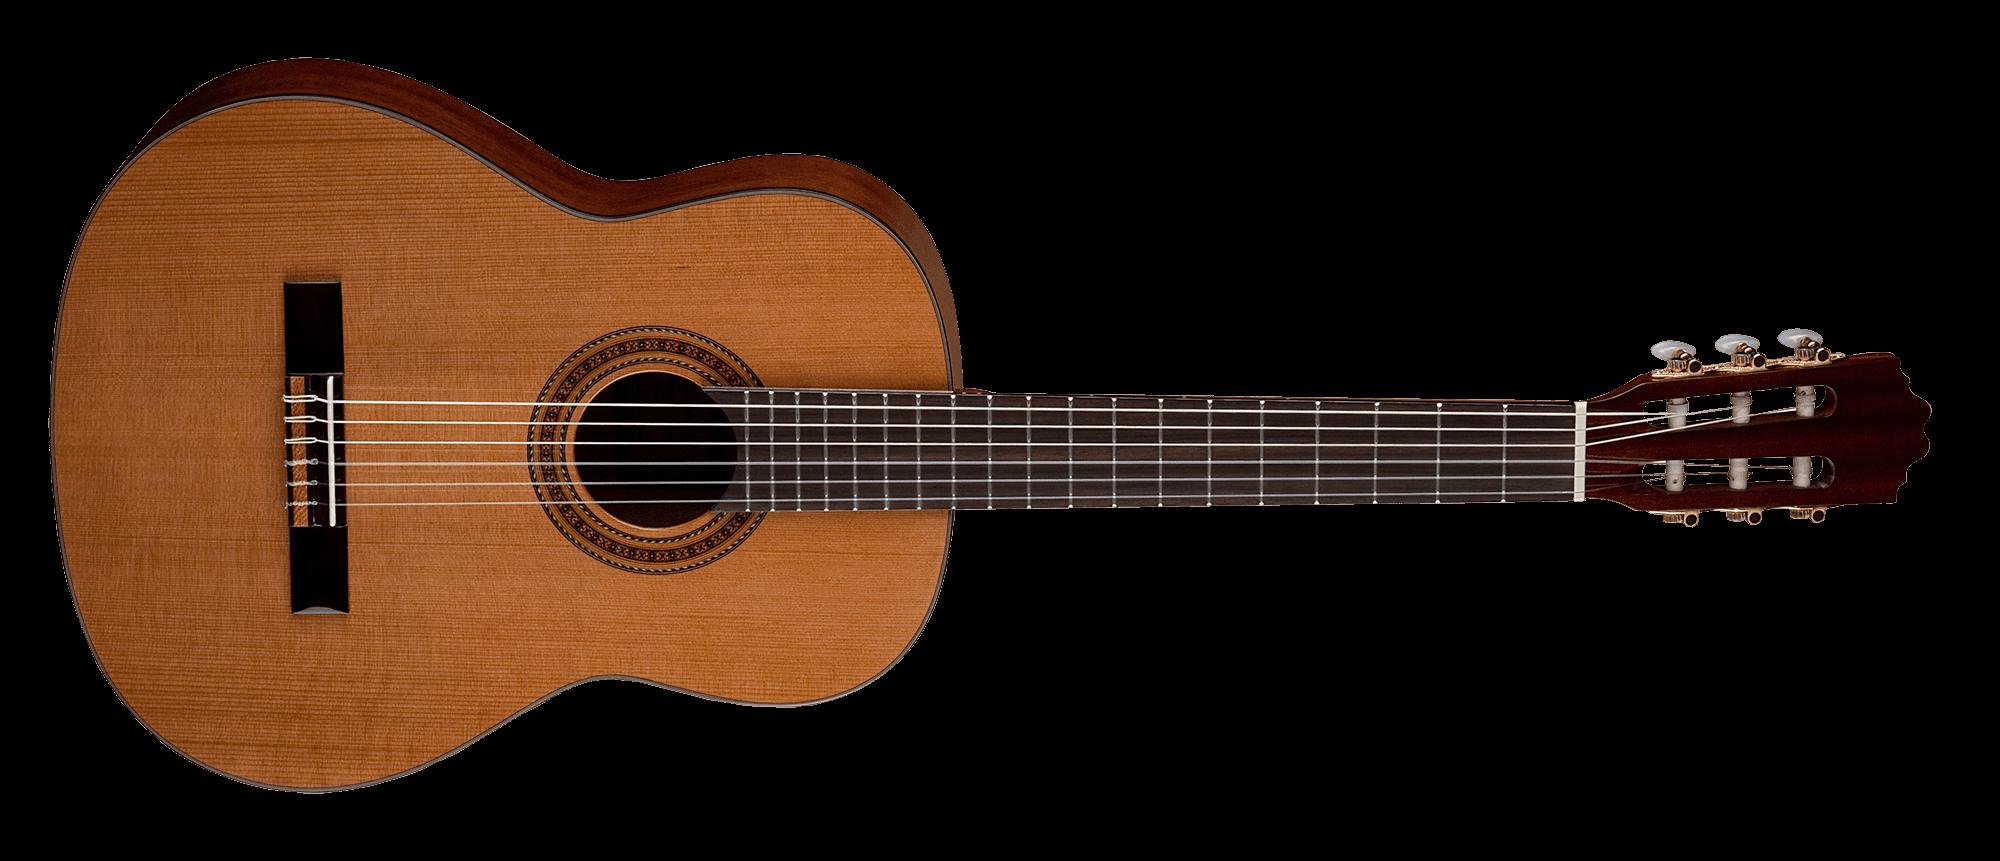 Dean Guitars Image